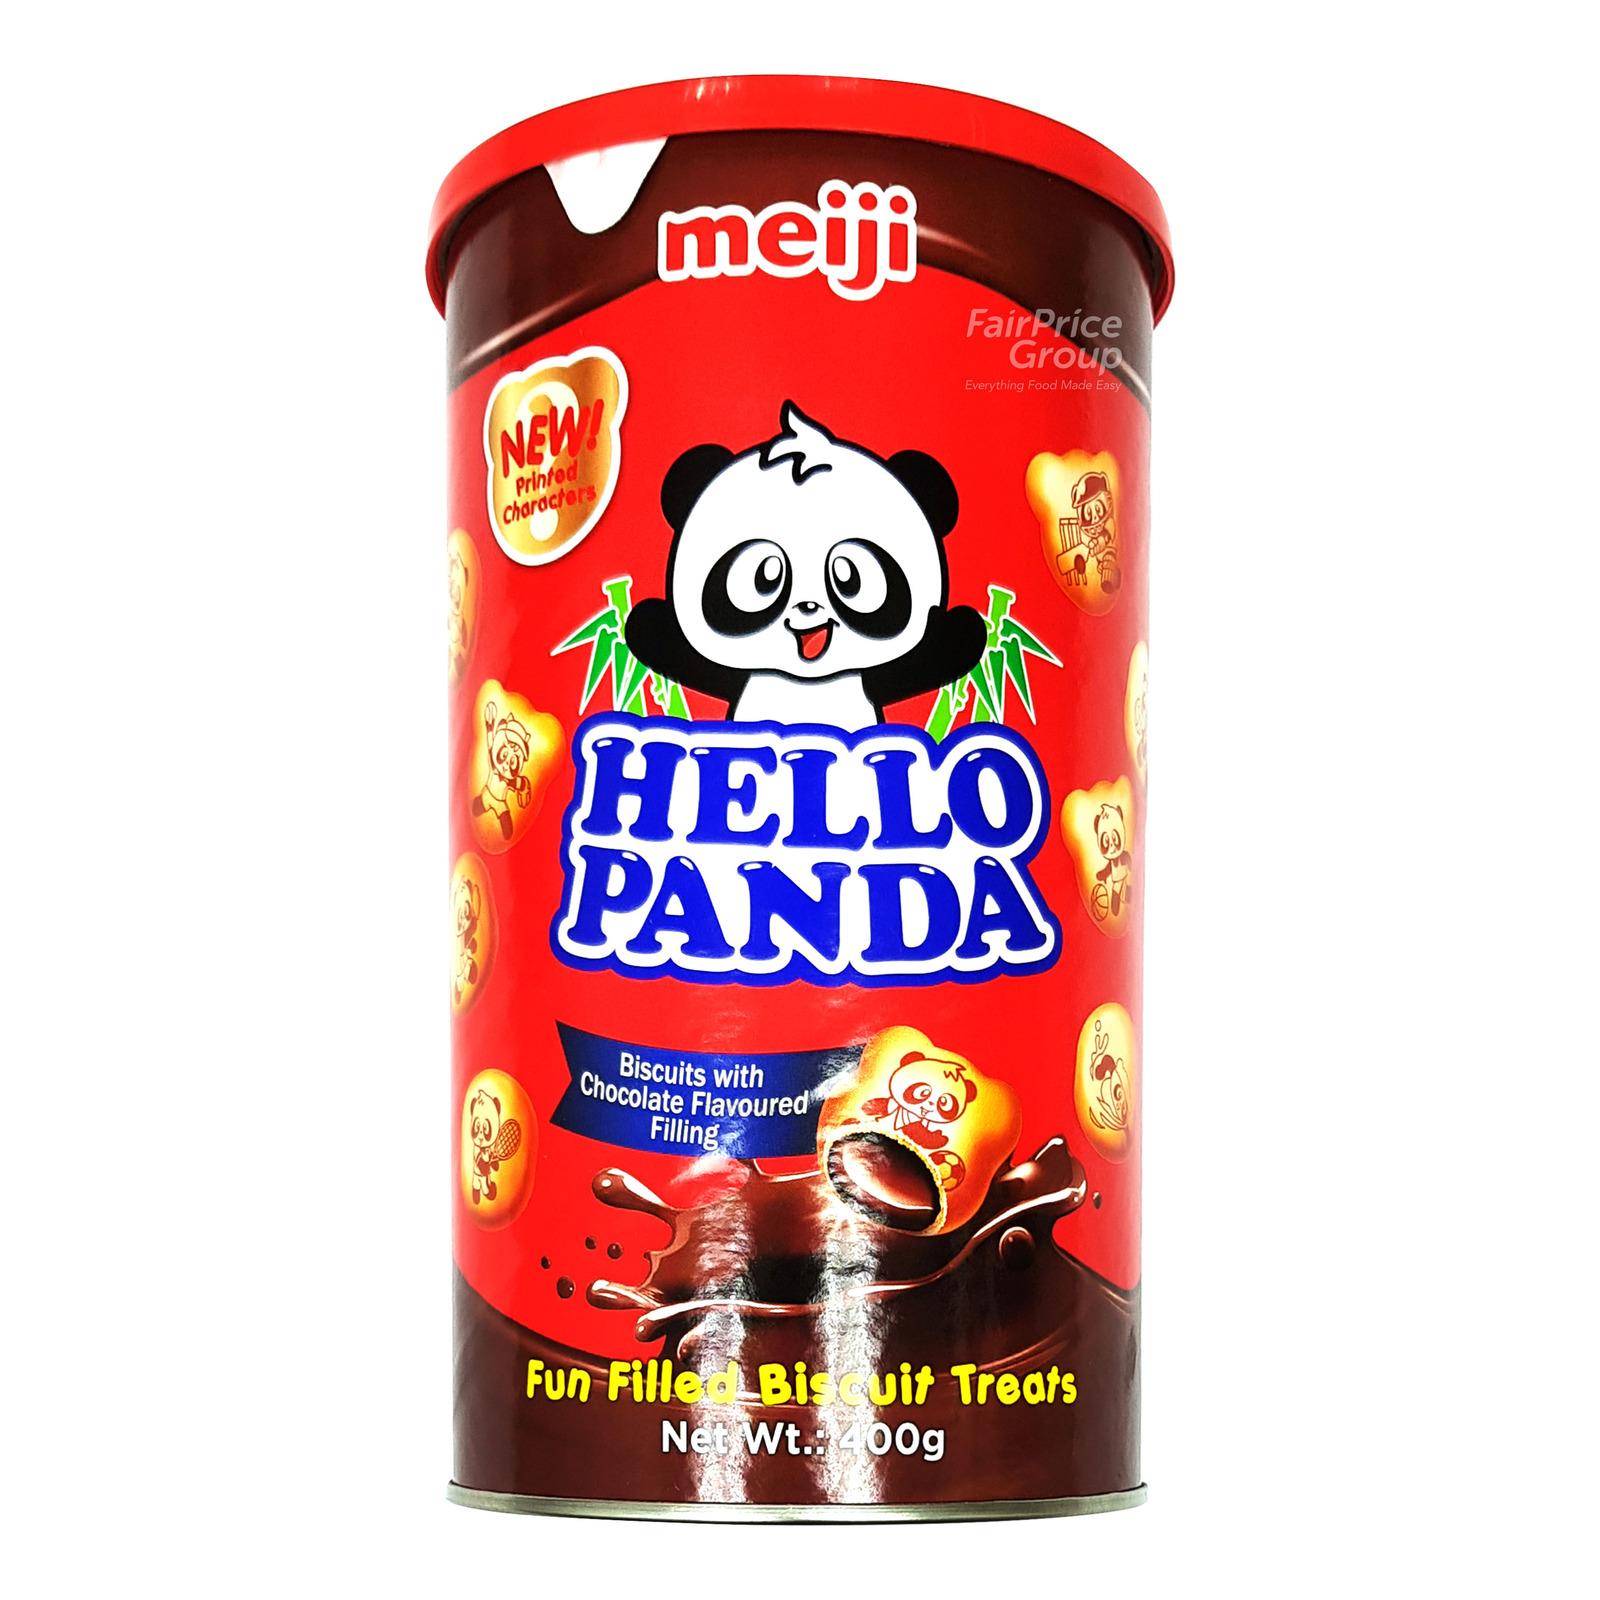 Meiji Hello Panda Biscuits - Chocolate